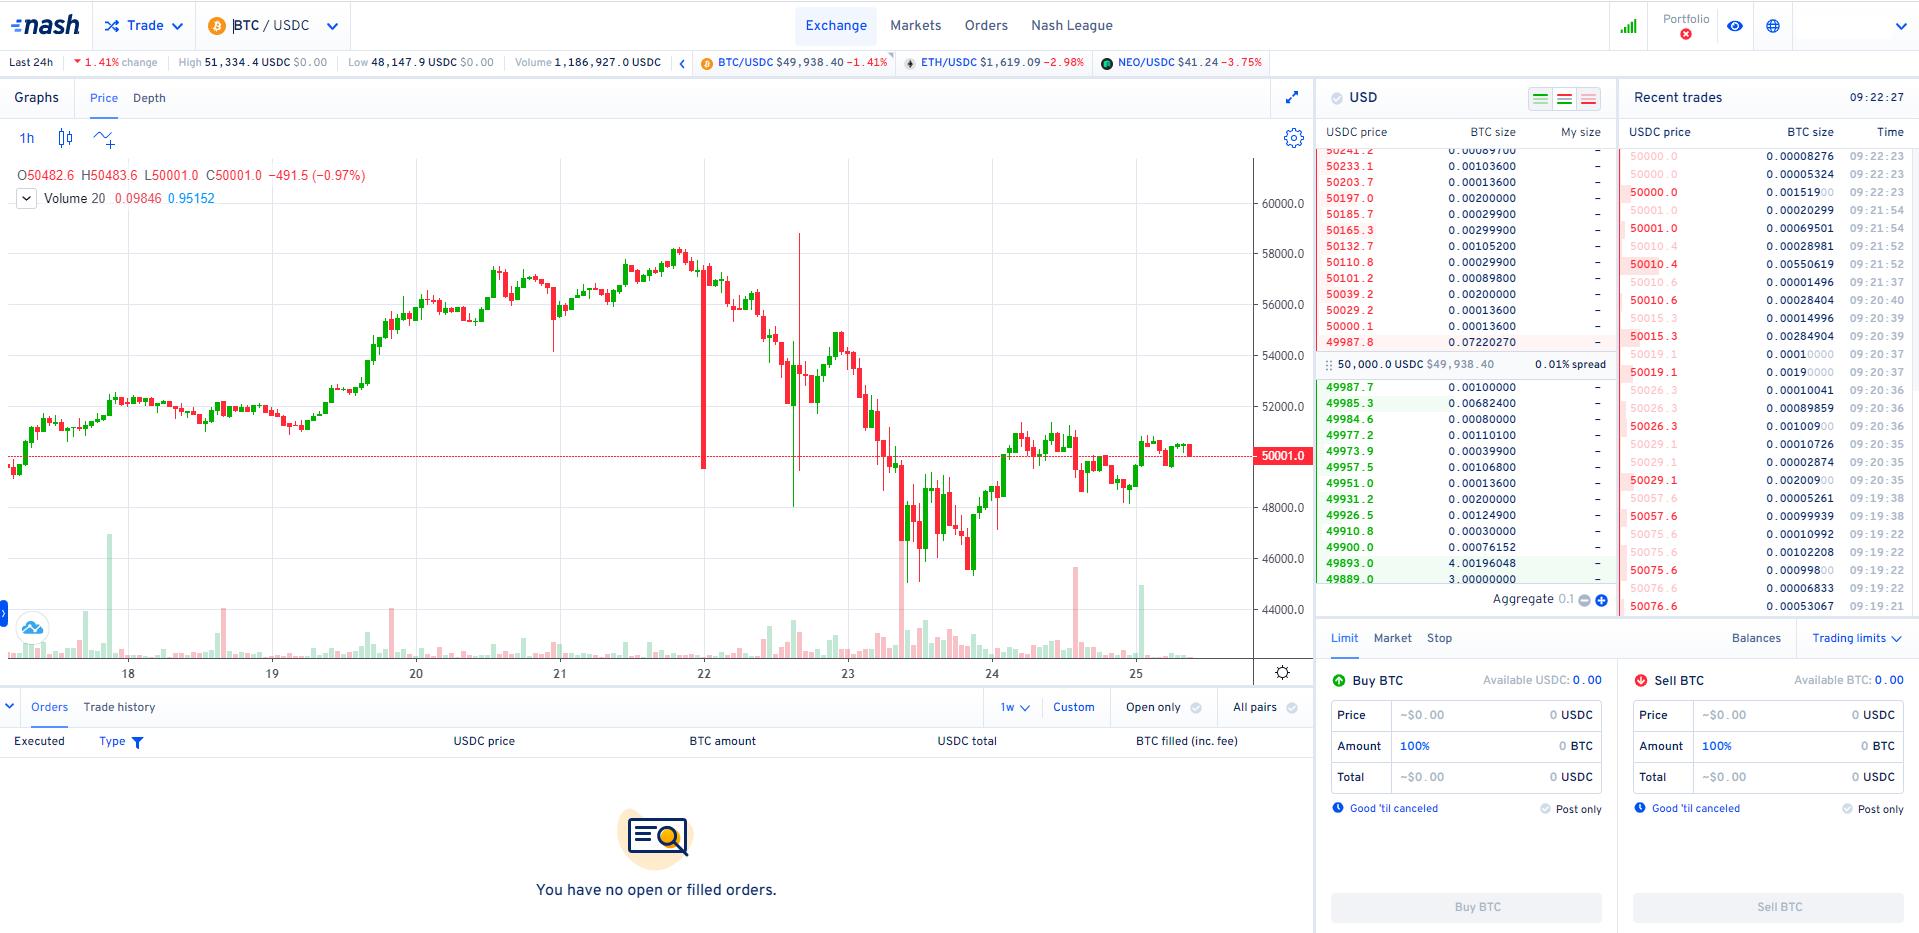 Nash Exchange Trading View